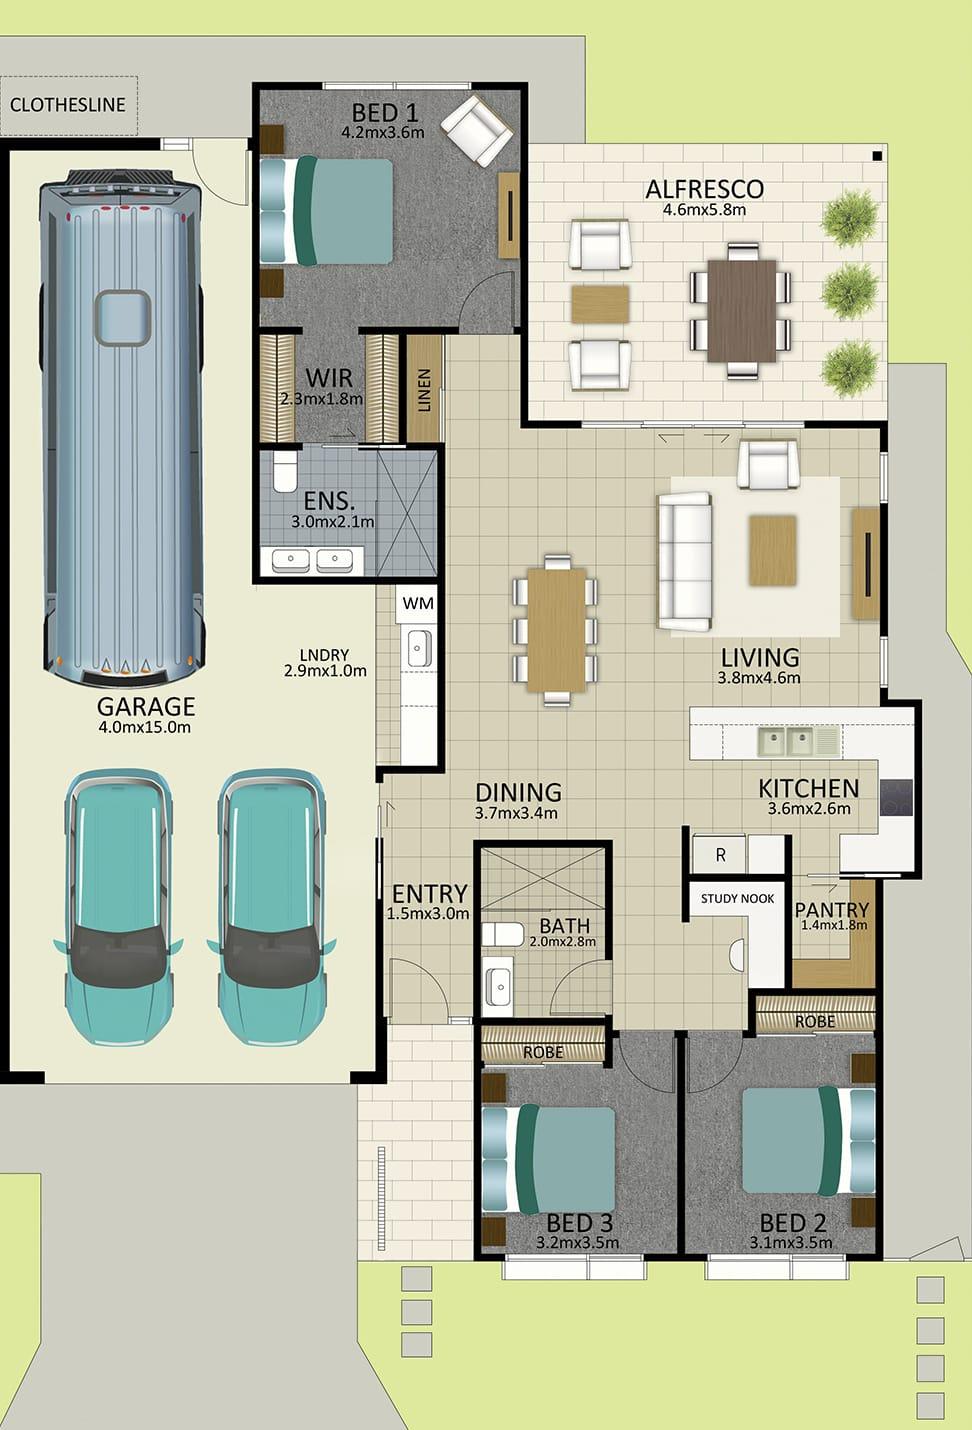 LR WEB Floorplan LOT 163 Watson MK3 JUL19 V1 - Lot 163